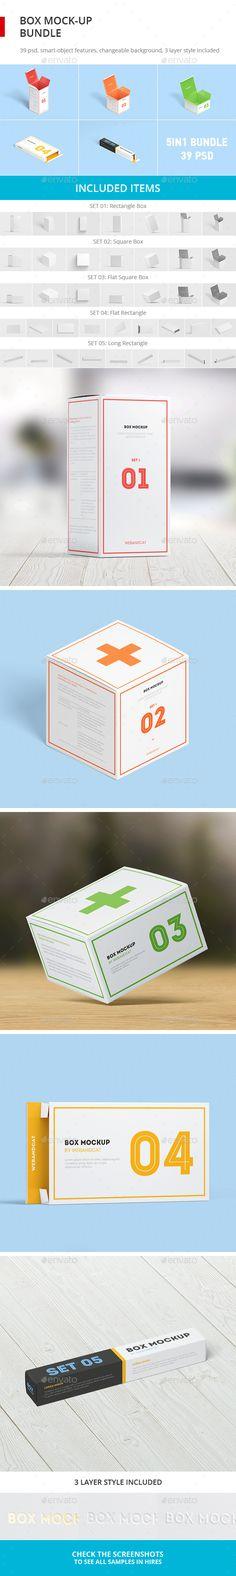 Box Mock-up Bundle #box #mockup #bundle